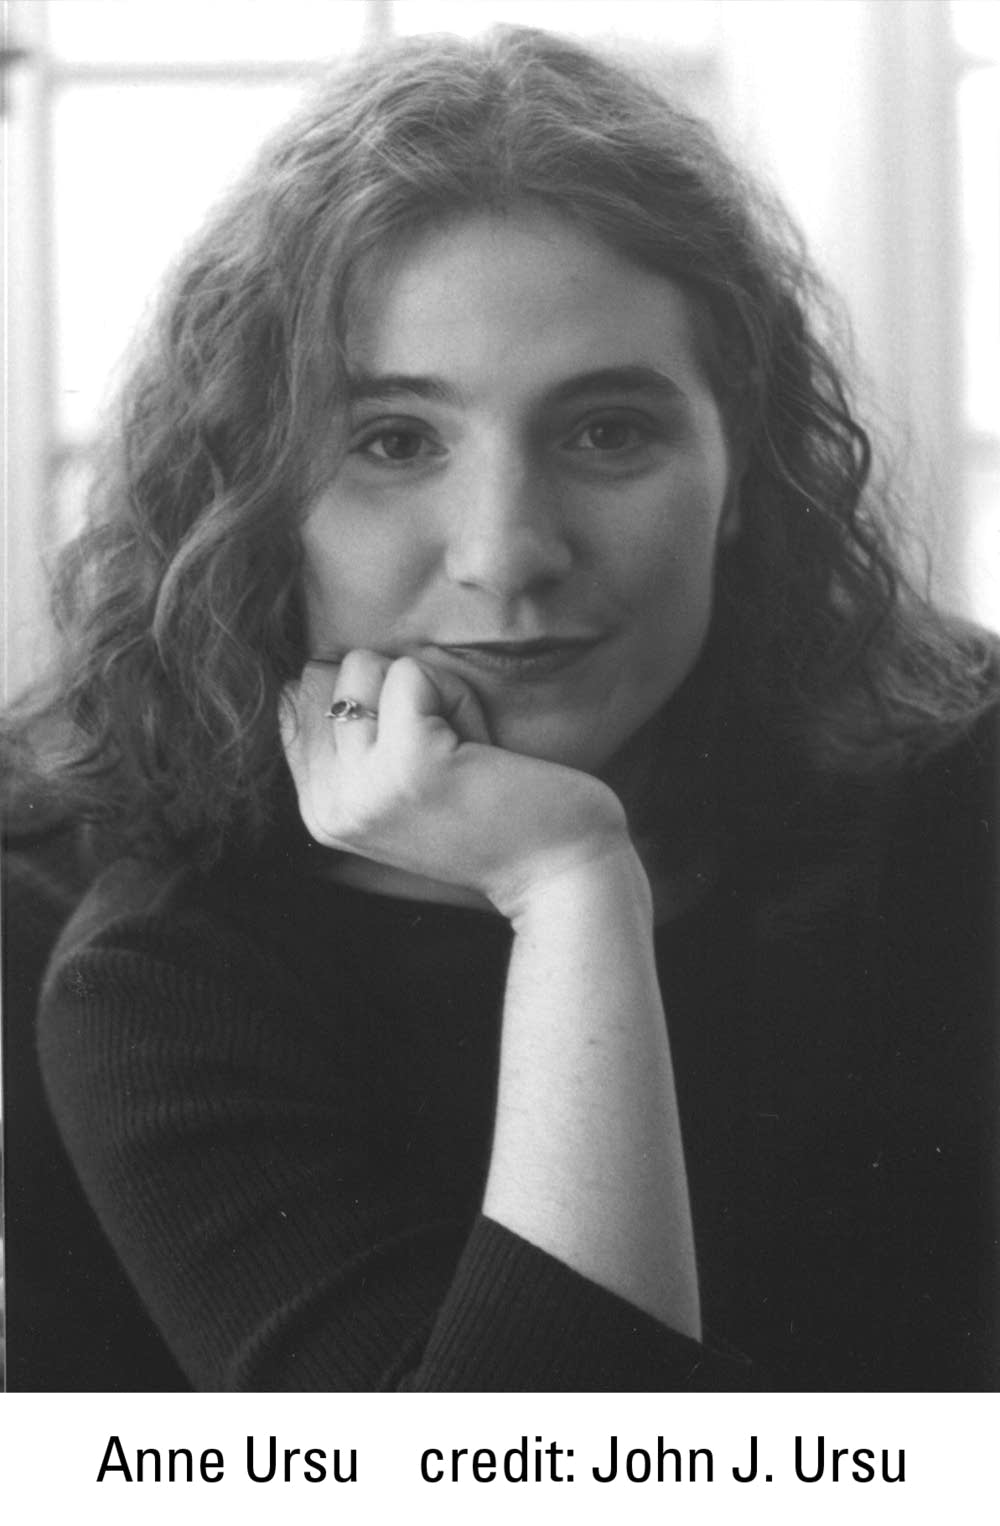 Anne Ursu